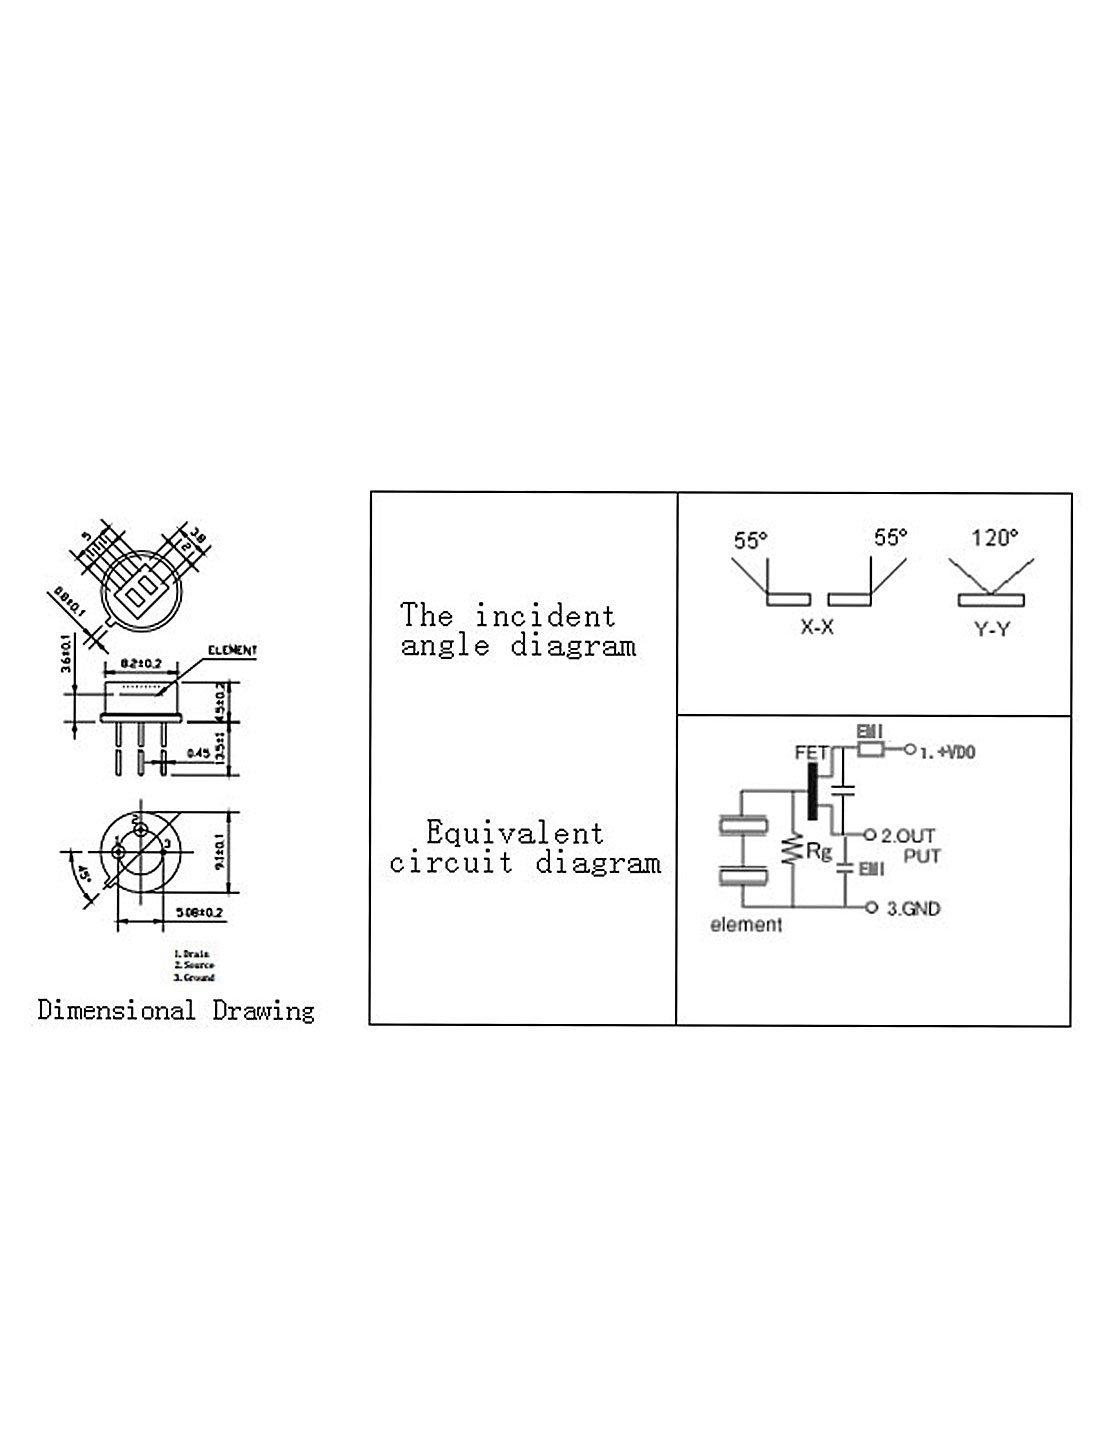 Dealmux 2 Pcs D204b Pyroelectric Infrared Radial Pir Motion Sensor Circuit Diagram Using Lm324 Detector Industrial Scientific